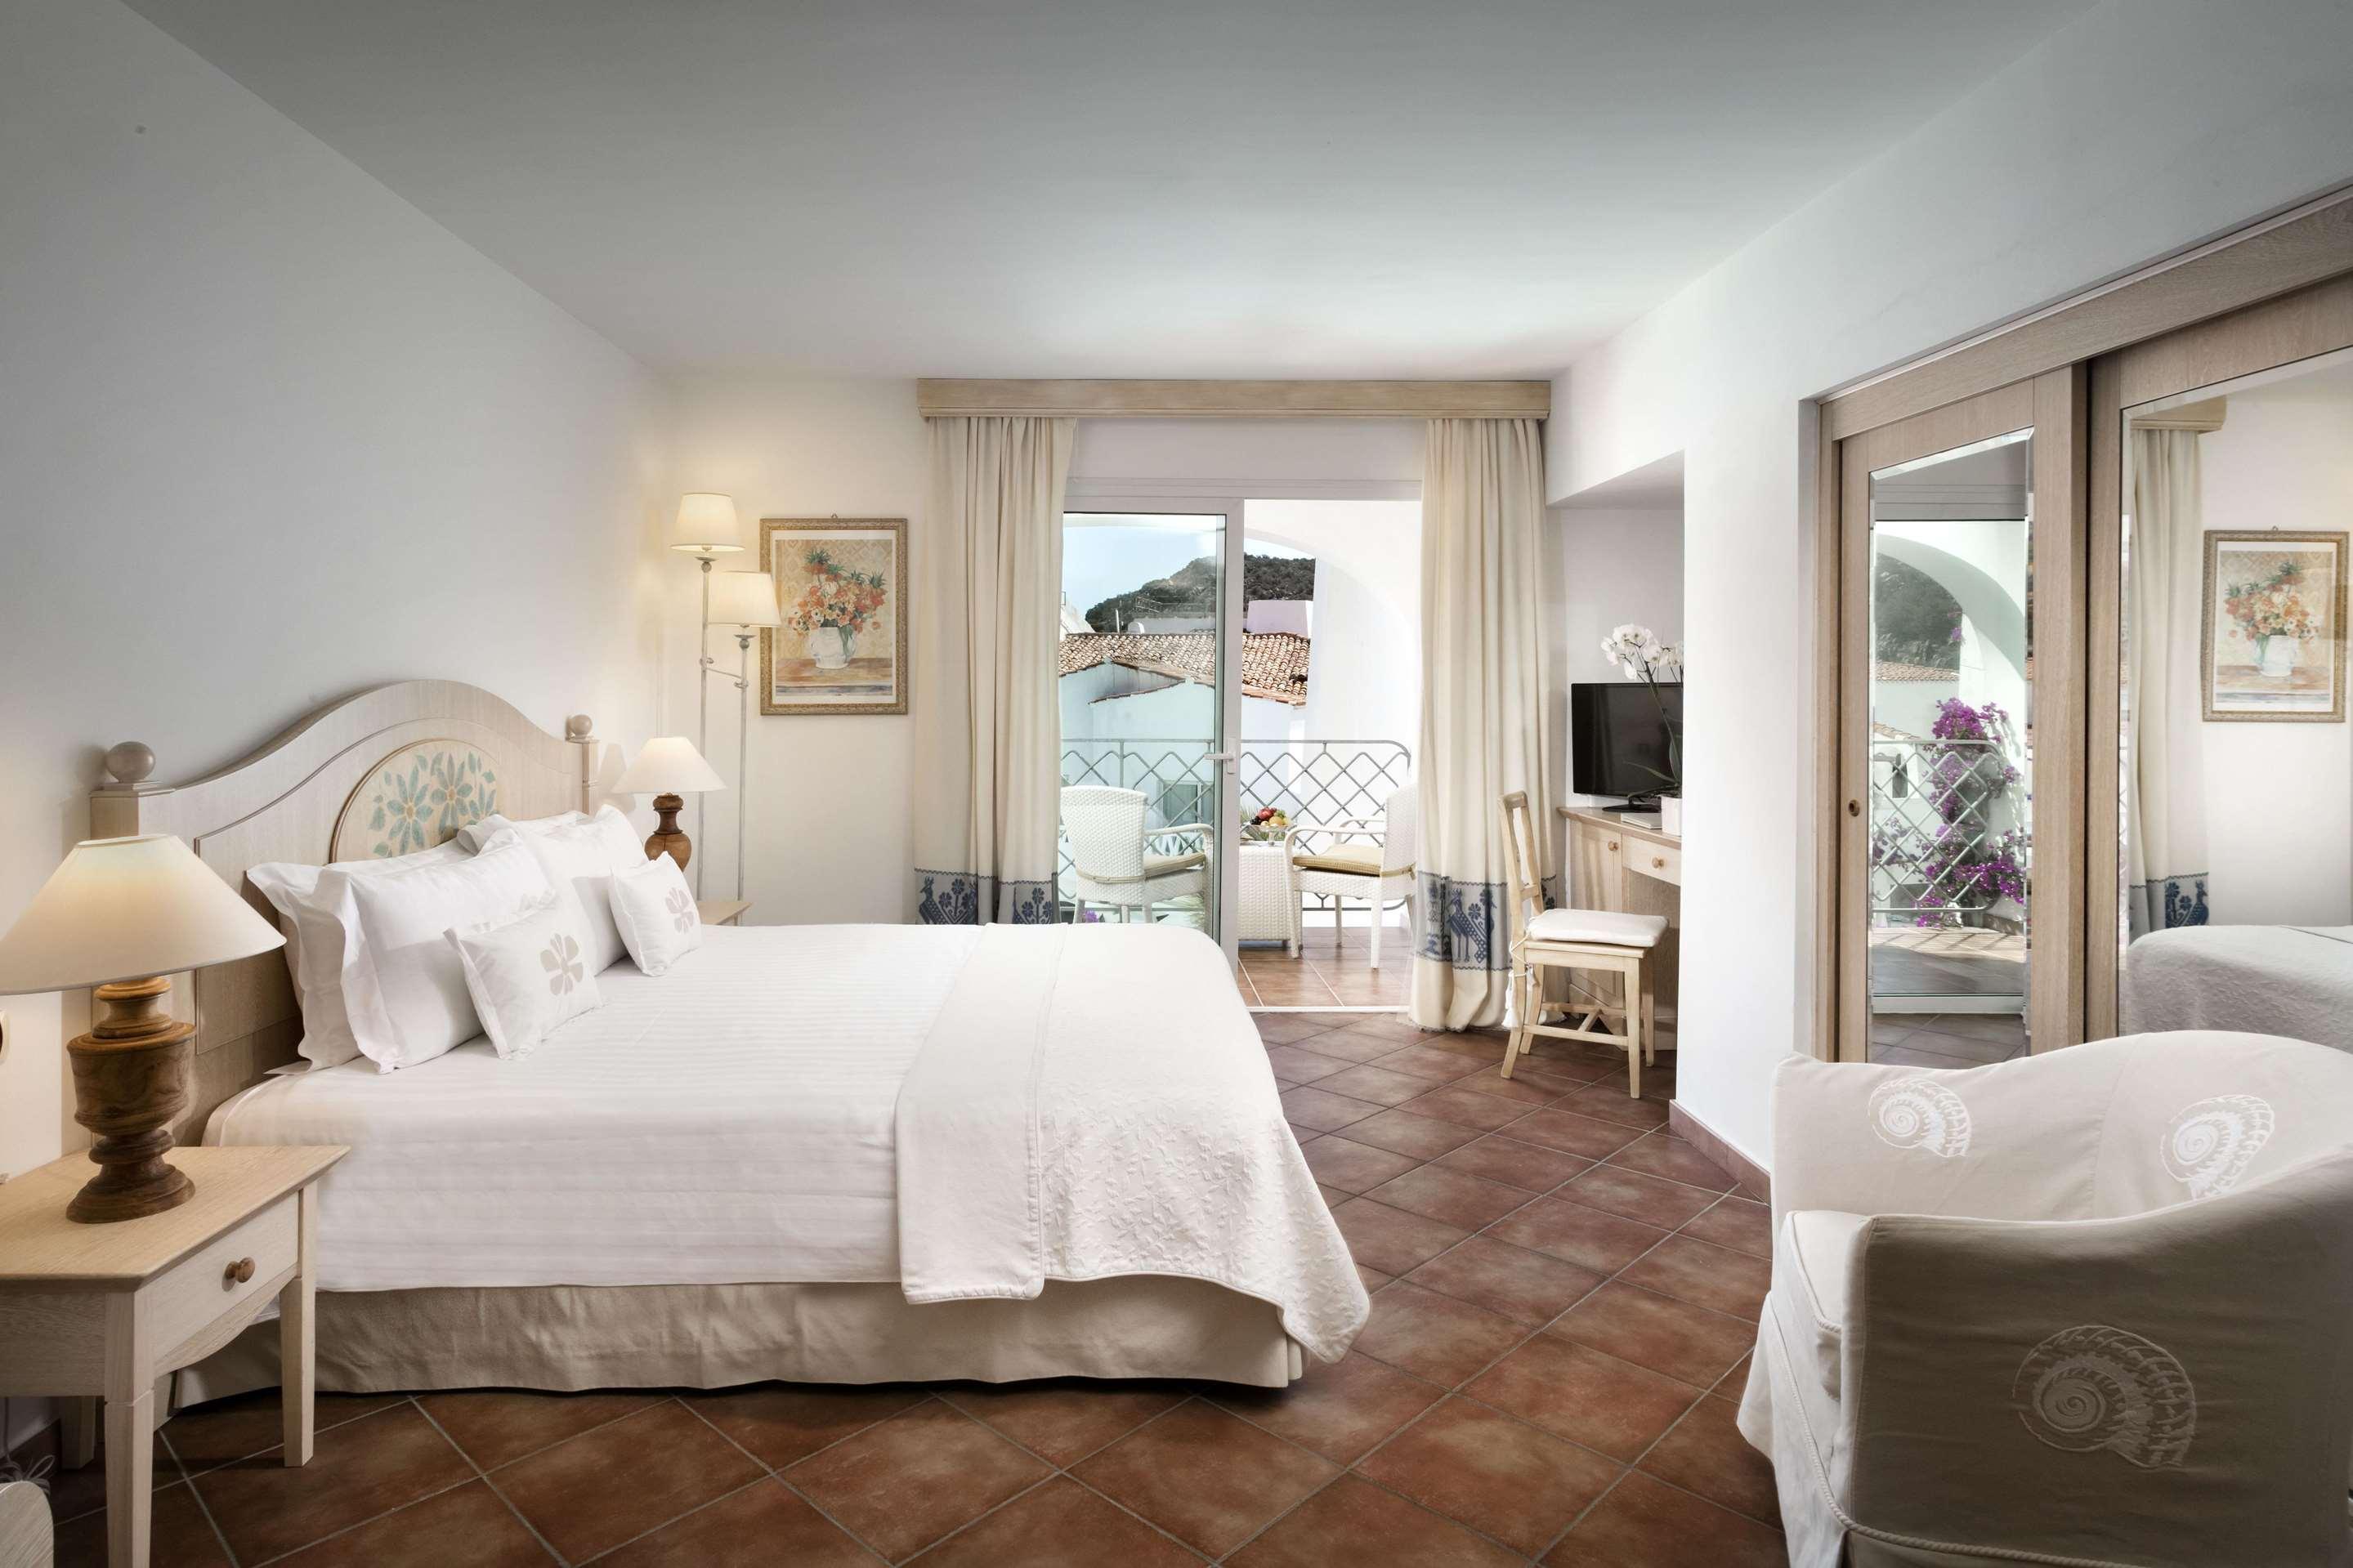 Grand Hotel Poltu Quatu Arzachena Sa Italy Compare Deals